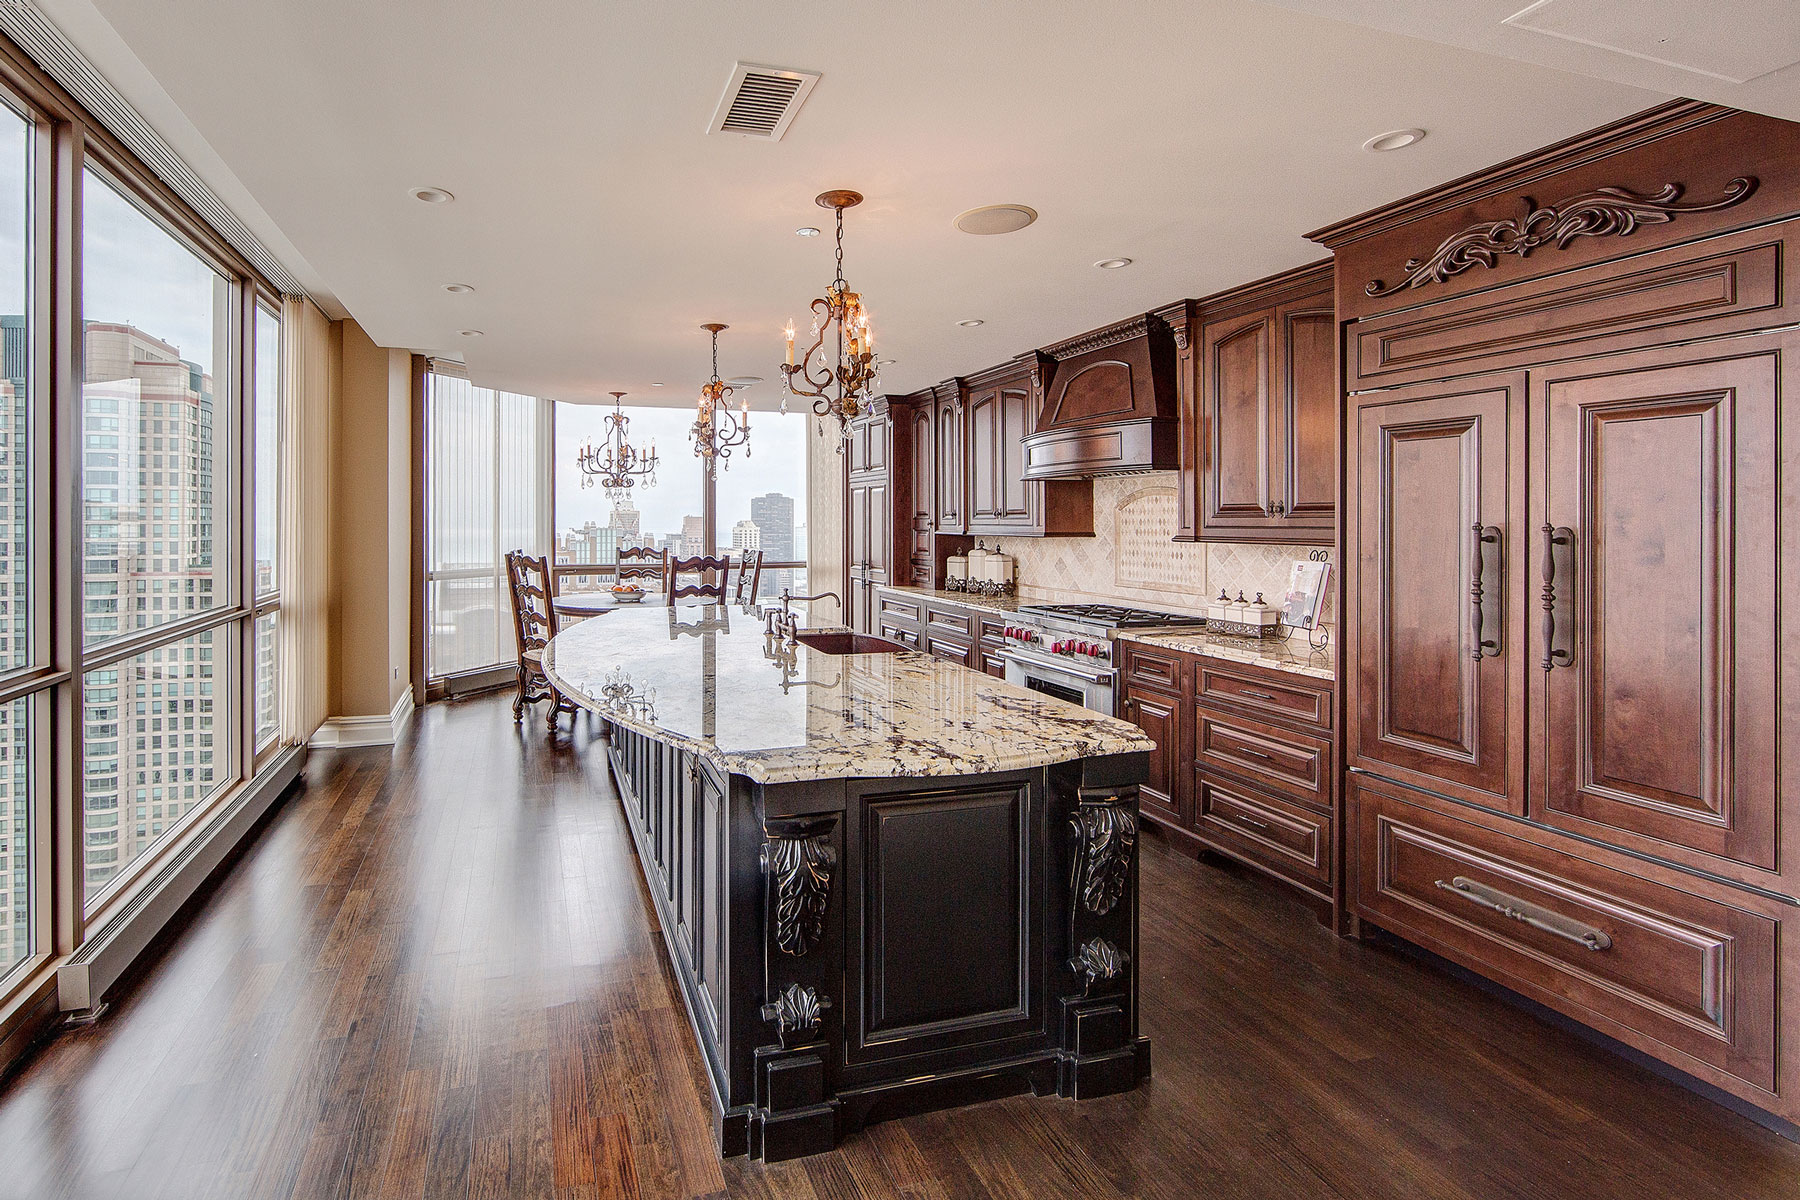 Bon Chicago Condo Kitchen Remodel